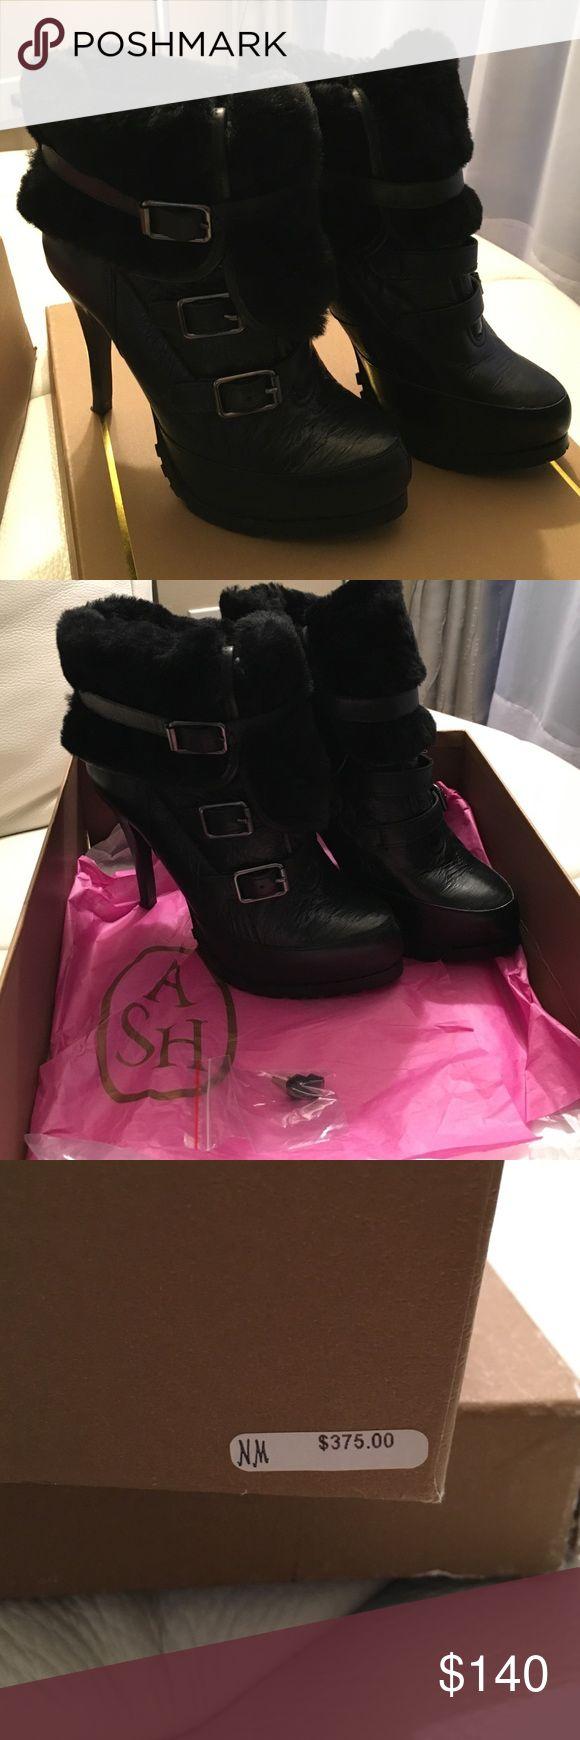 Ash Boots Women's Black Enigma Faux Rabbit Fur-lined Ankle Boots. Worn couple times. Ash Shoes Ankle Boots & Booties